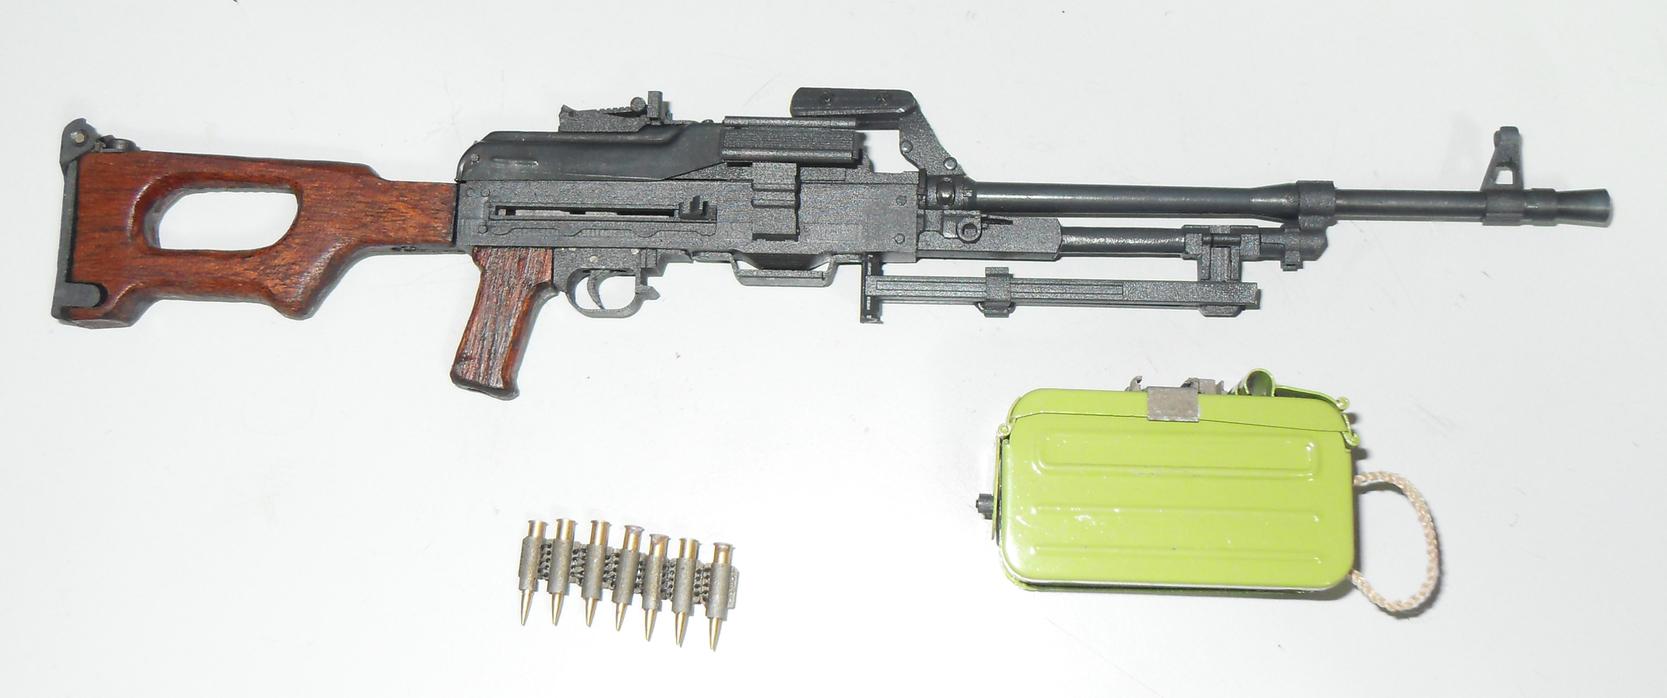 SDC12163